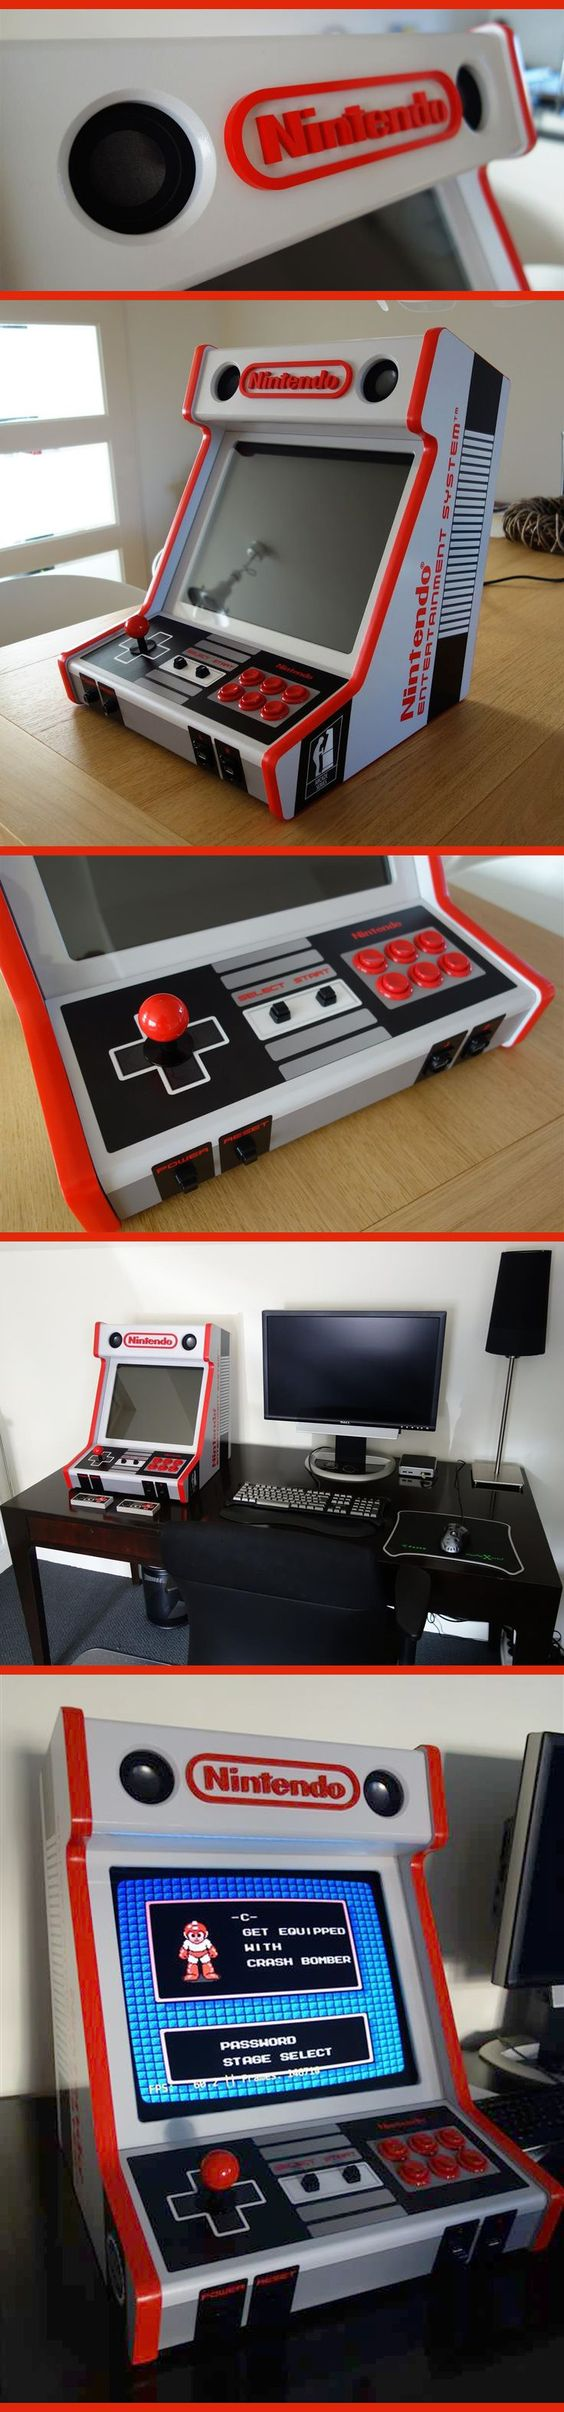 Custom Made NES Bartop Arcade Cabinet, super nostalgic retro Nintendo style via ArcadeControls forums user edekoning